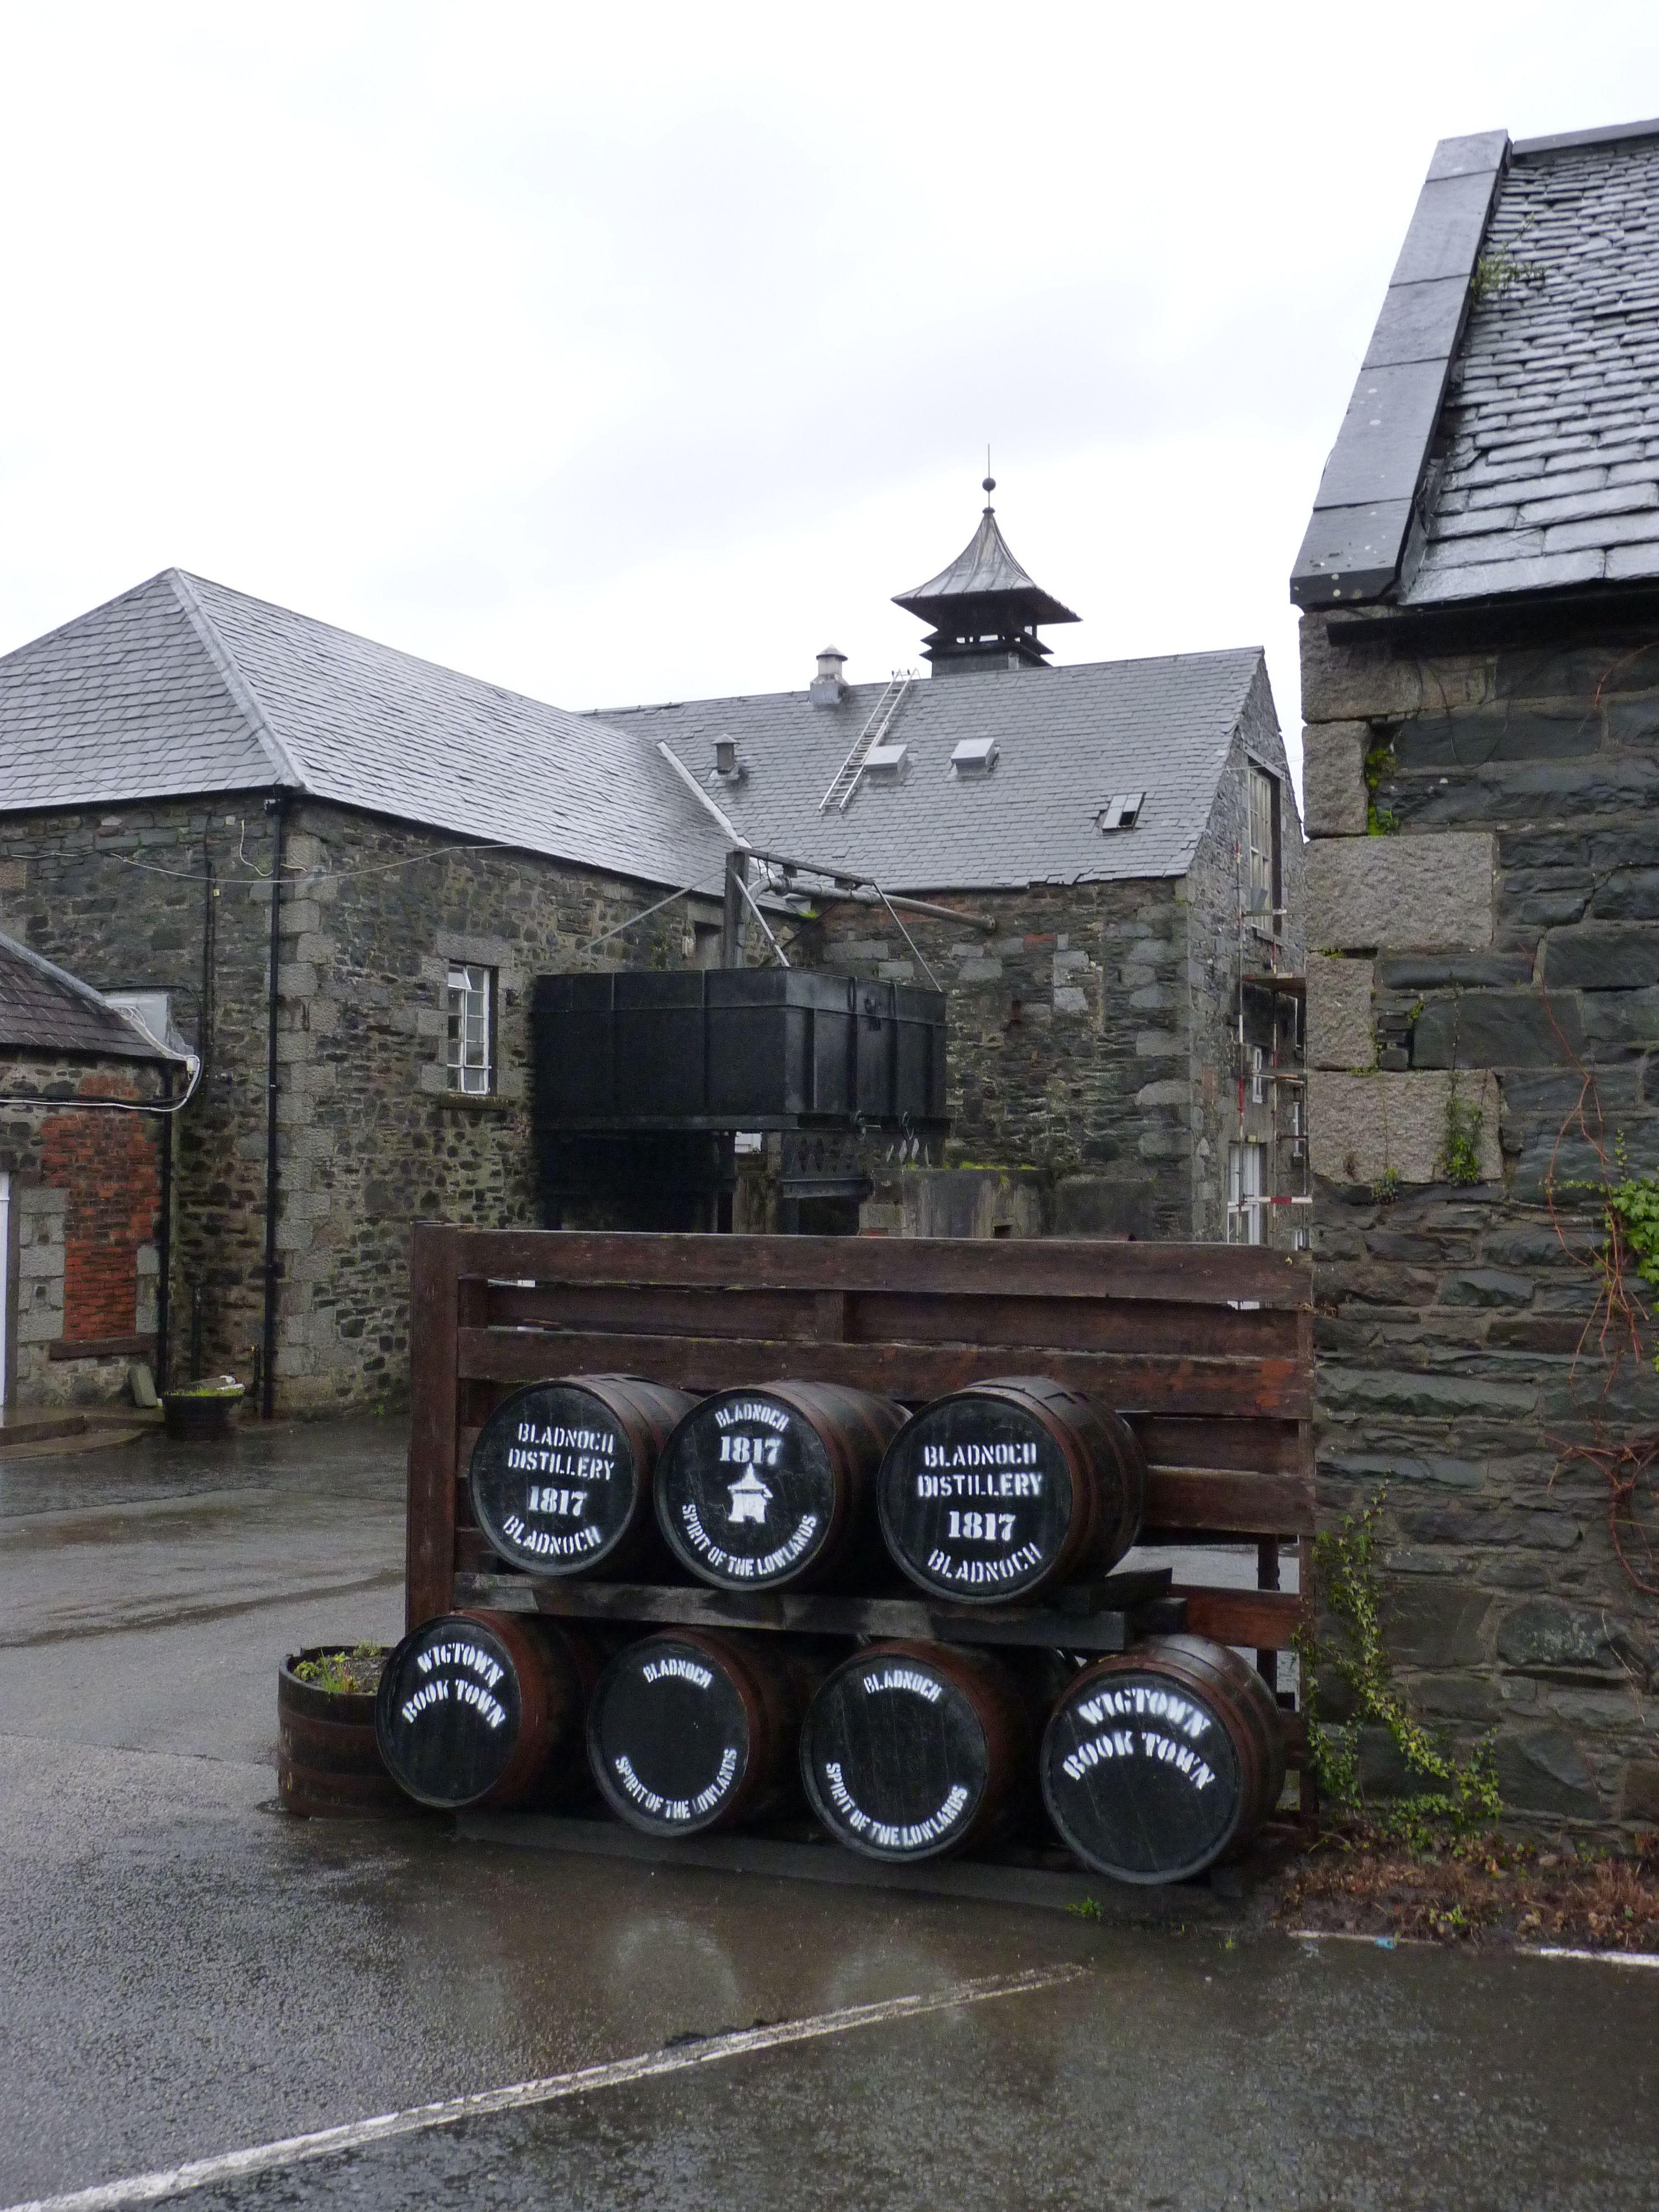 Bladnoch Distillery ( explore your biking wanderlust on www.motorcyclescotland.com )